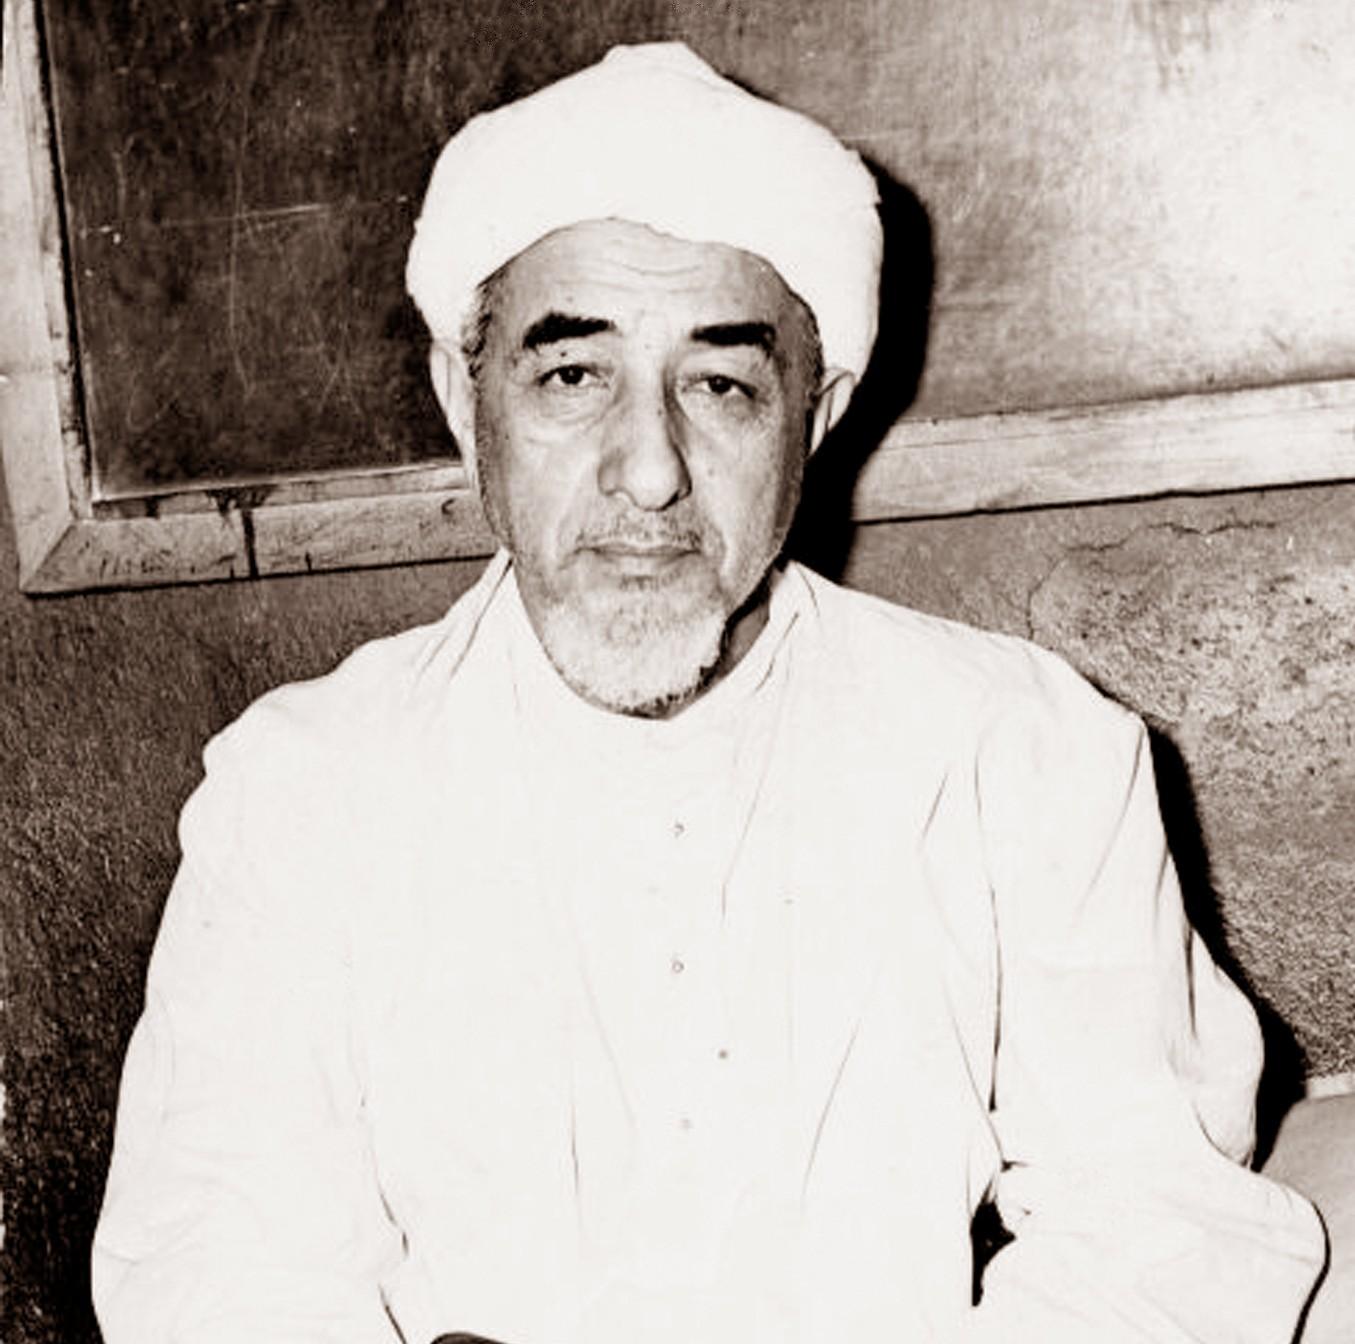 Salat and Istighfar of Habib Ahmad bin Muhsin al-Haddar